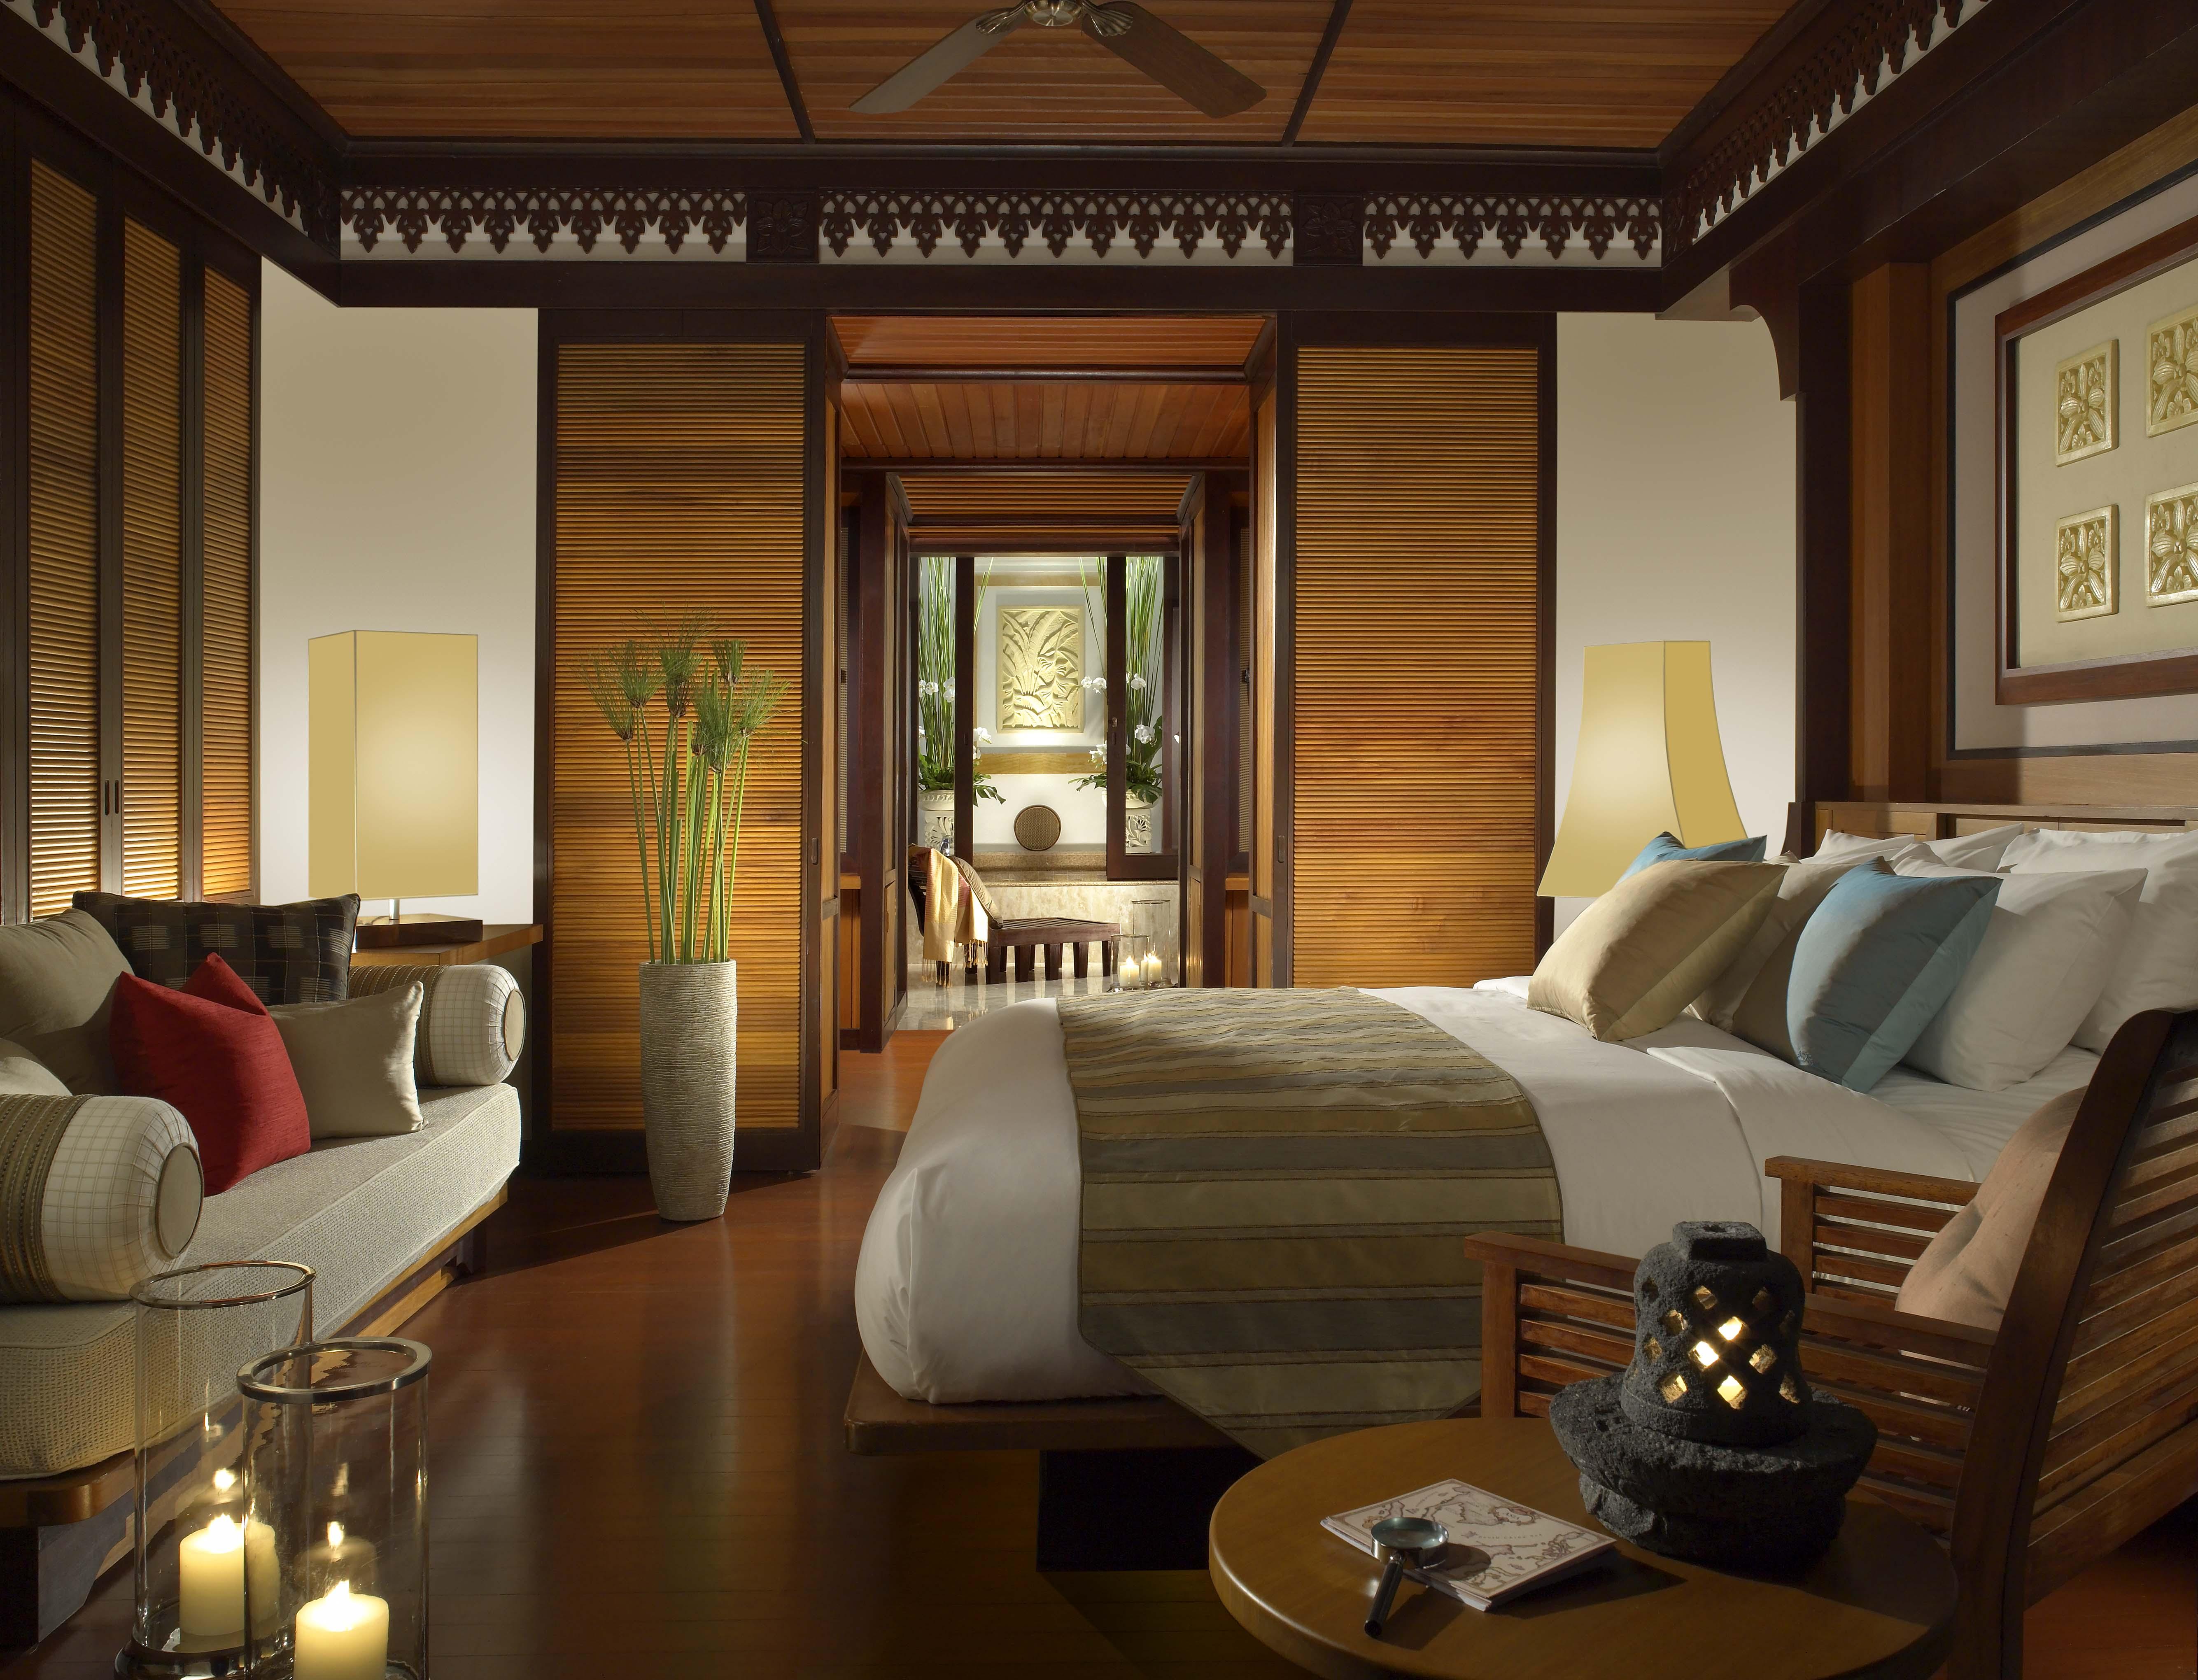 Pangkor laut resort luxury hotel in pangkor laut for Interior design of villa